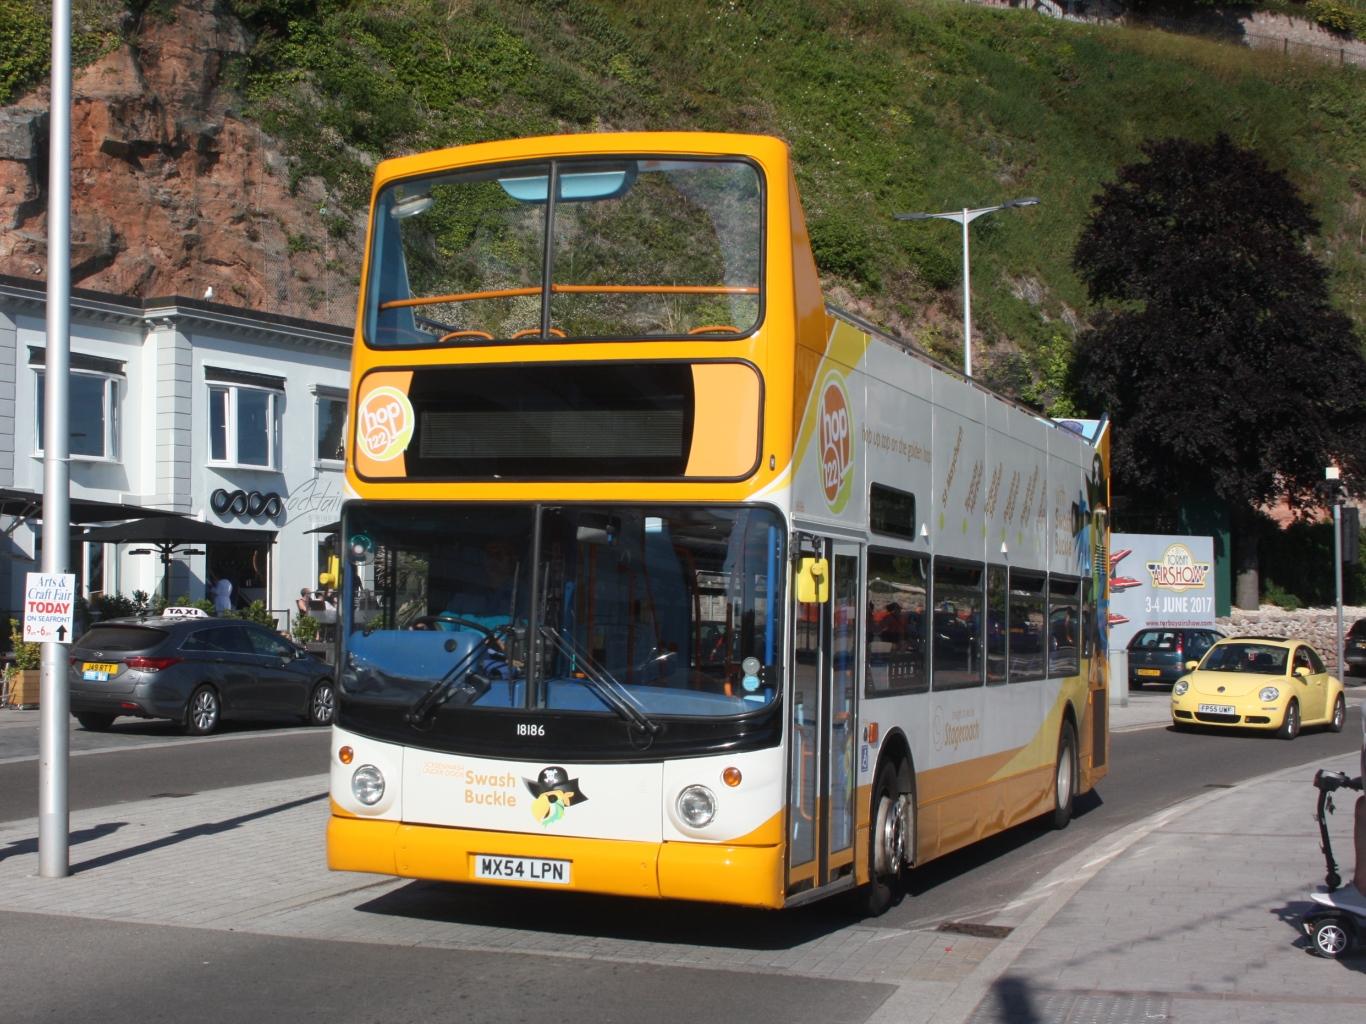 File:Torquay Torbay Road - Stagecoach 18186 (MX54LPN).JPG